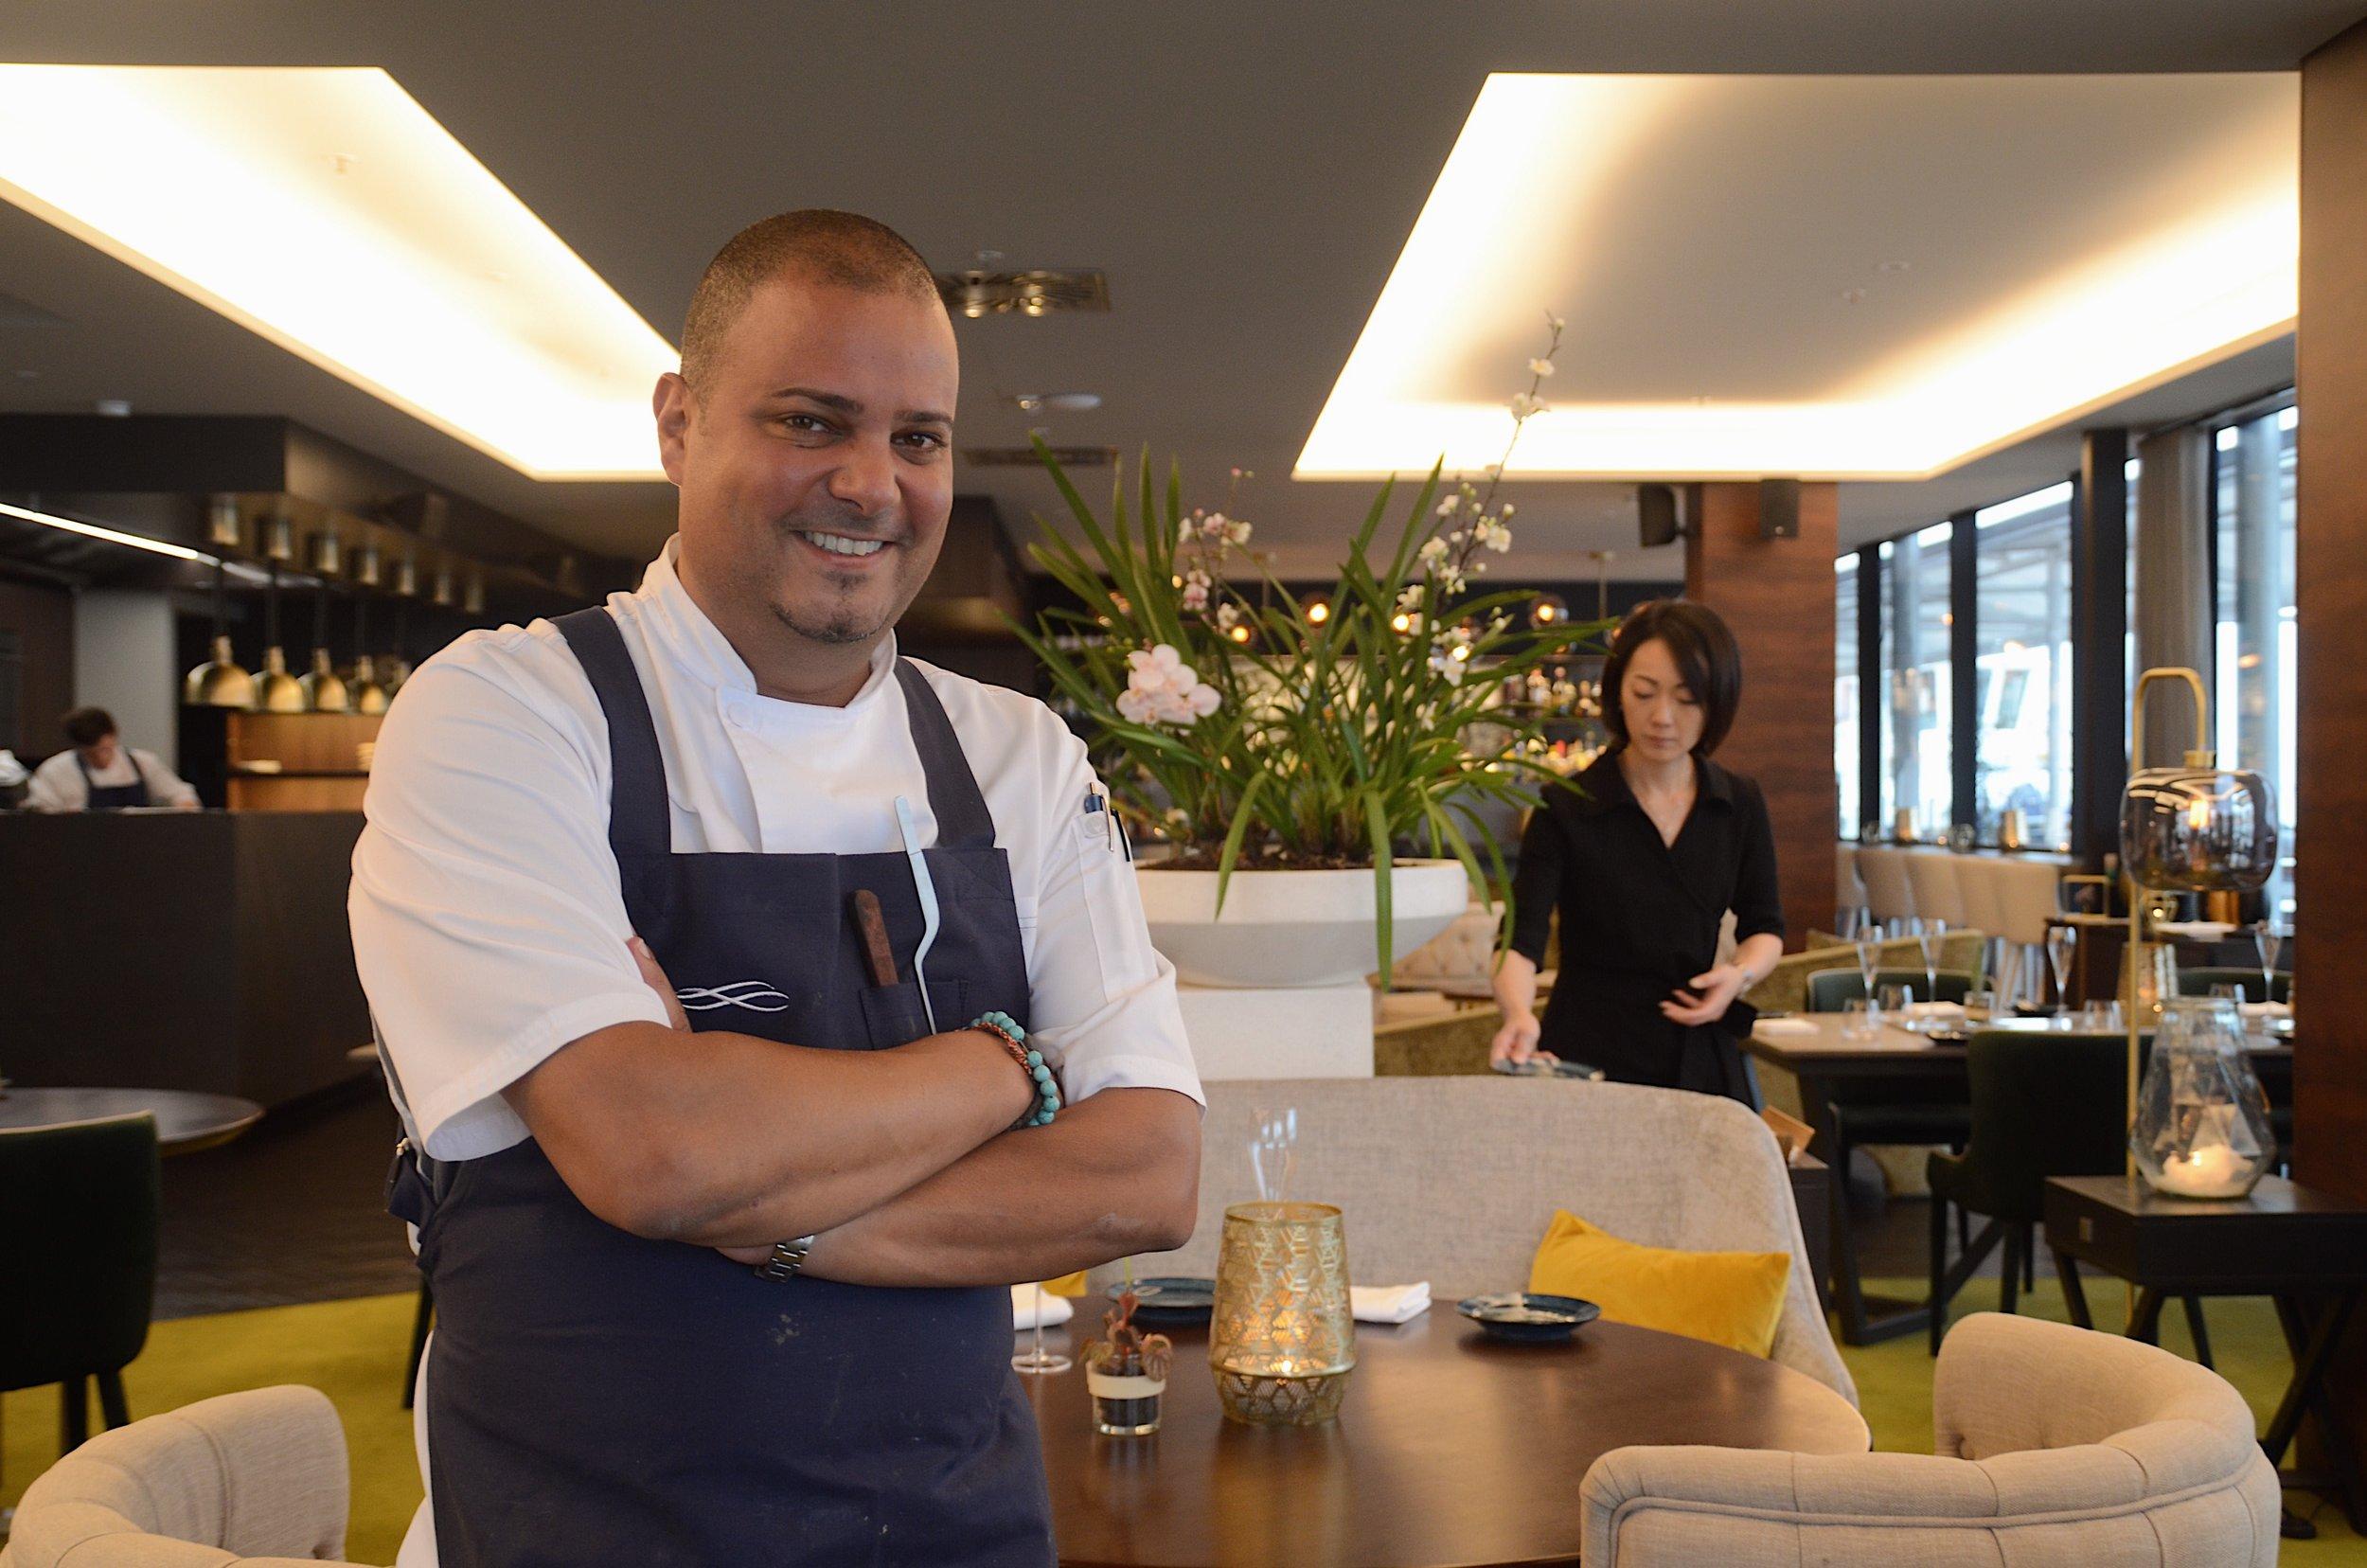 Ruben Koopman, Executive Chef and Director of Hospitality